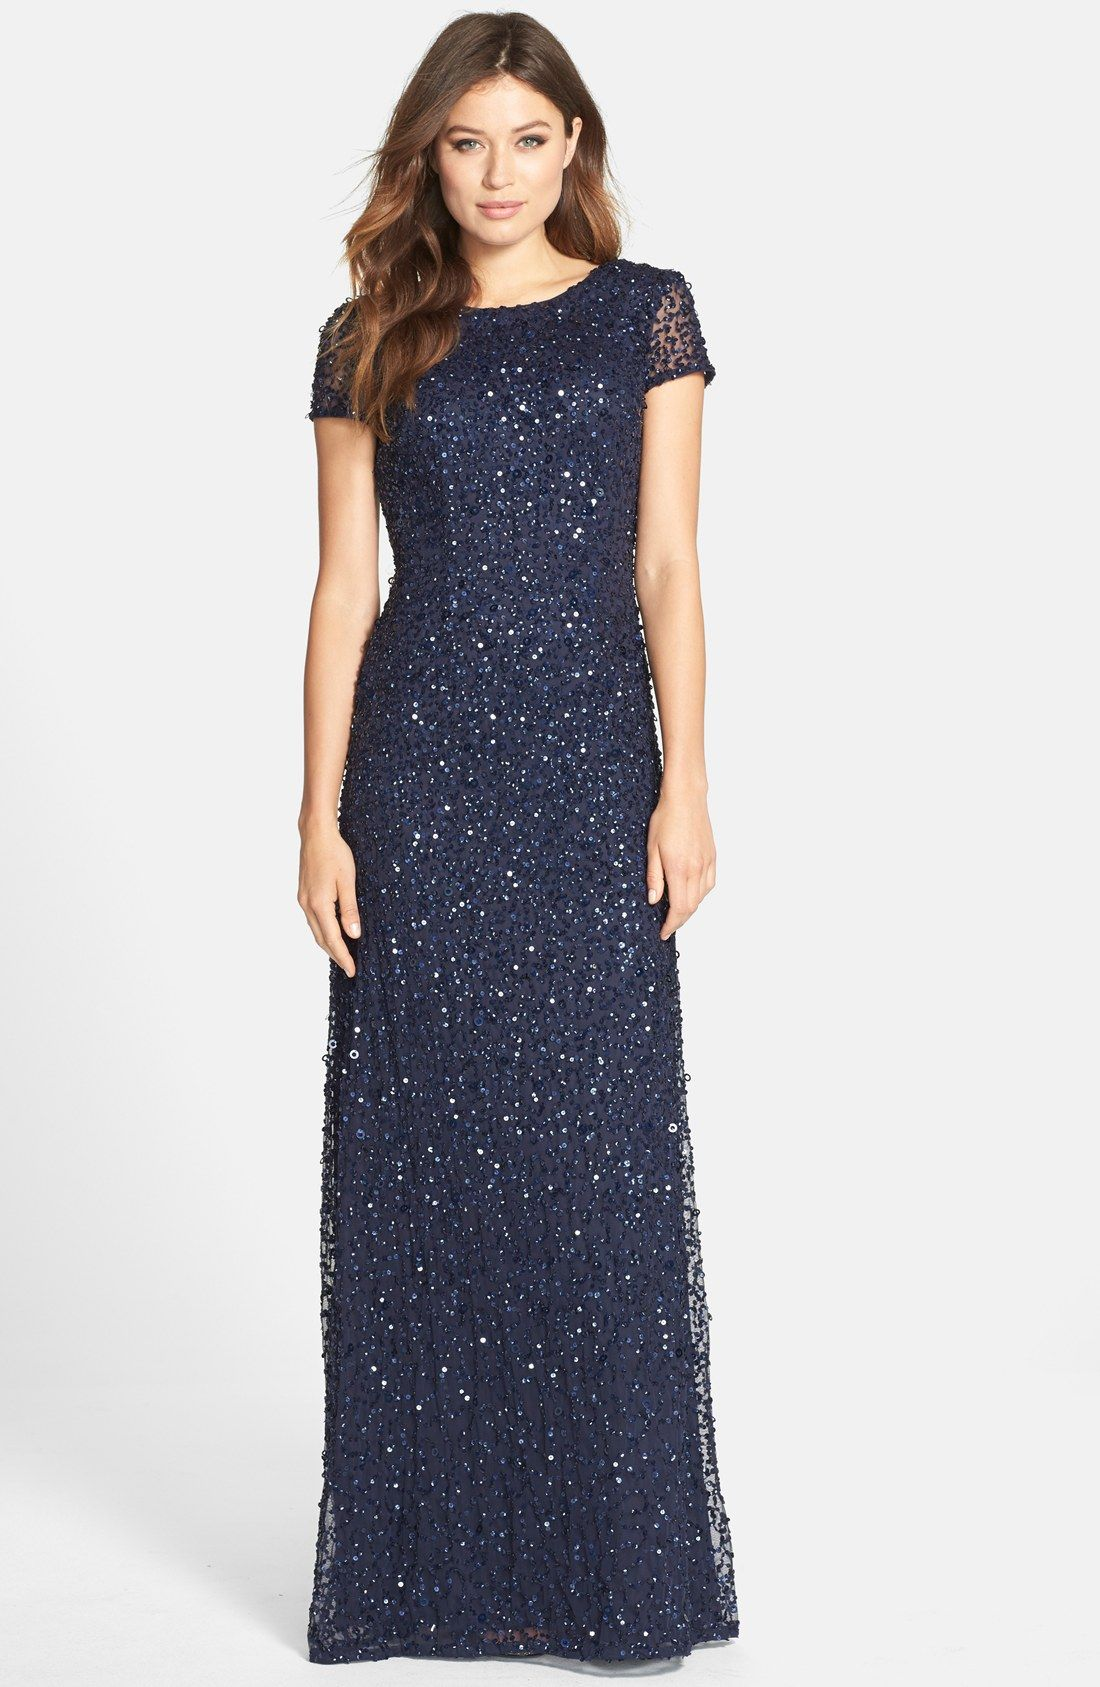 868ecd94 Adrianna Papell Short Sleeve Sequin Mesh Gown (Regular & Petite) | Nordstrom